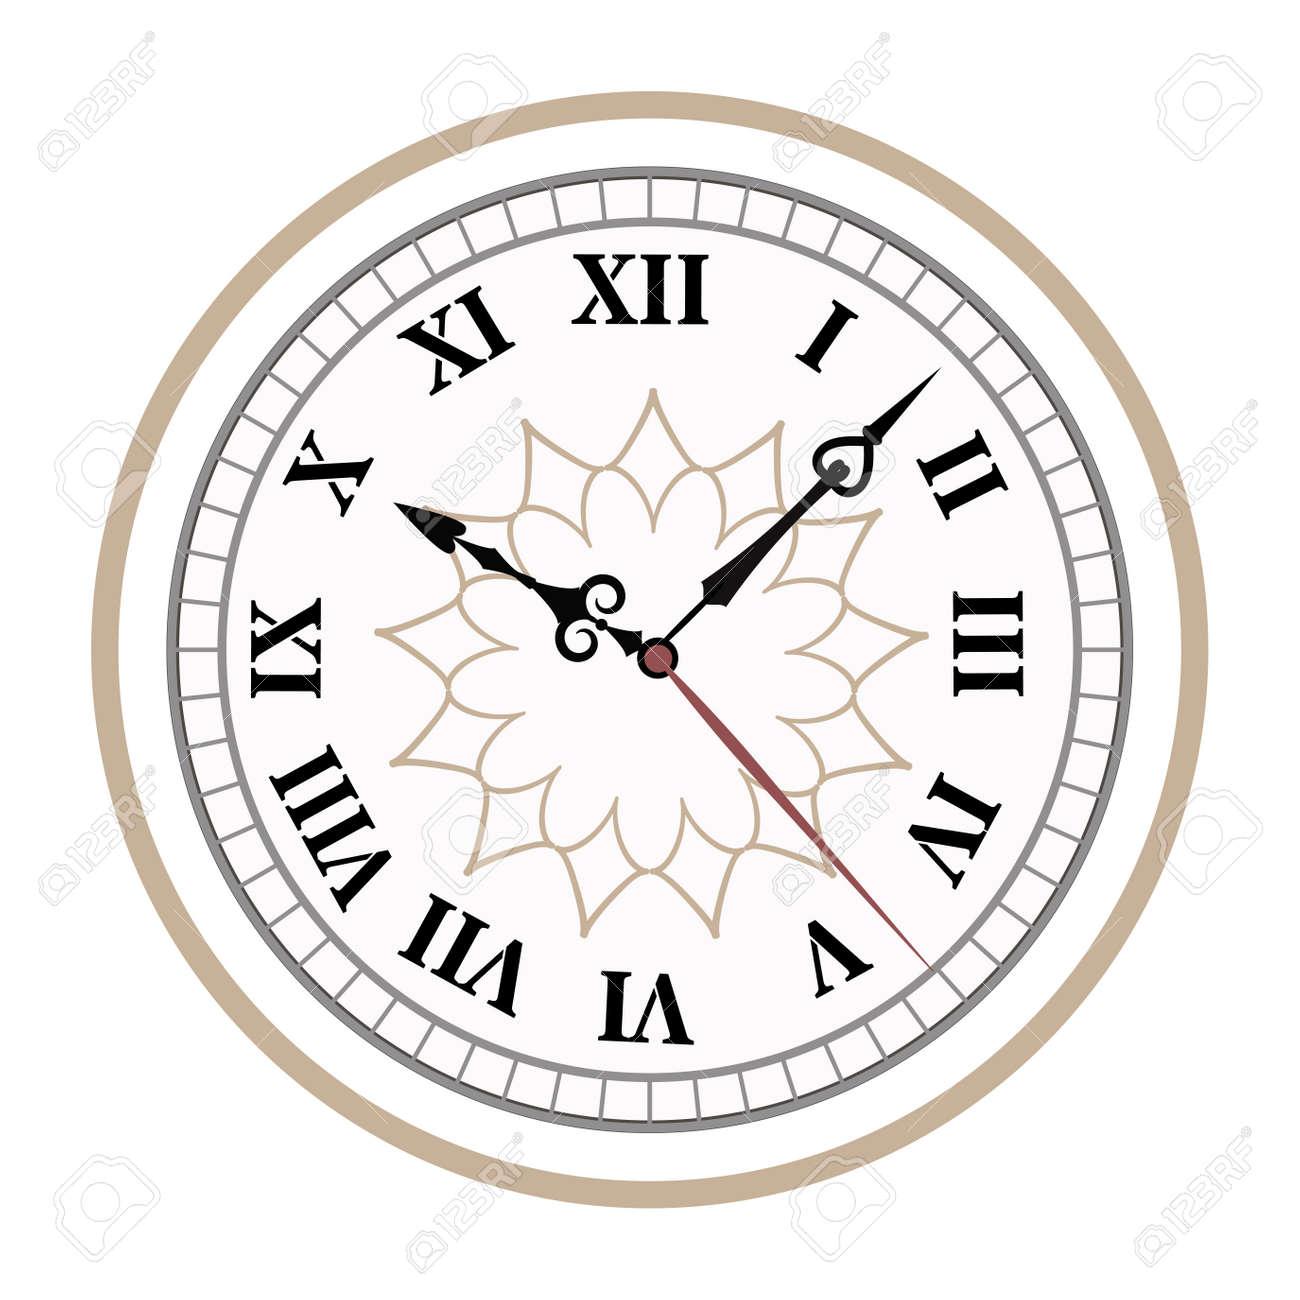 Clock Uhr Alarme Vektor-Icons Illustration. Zifferblatt-Symbole Auf ...